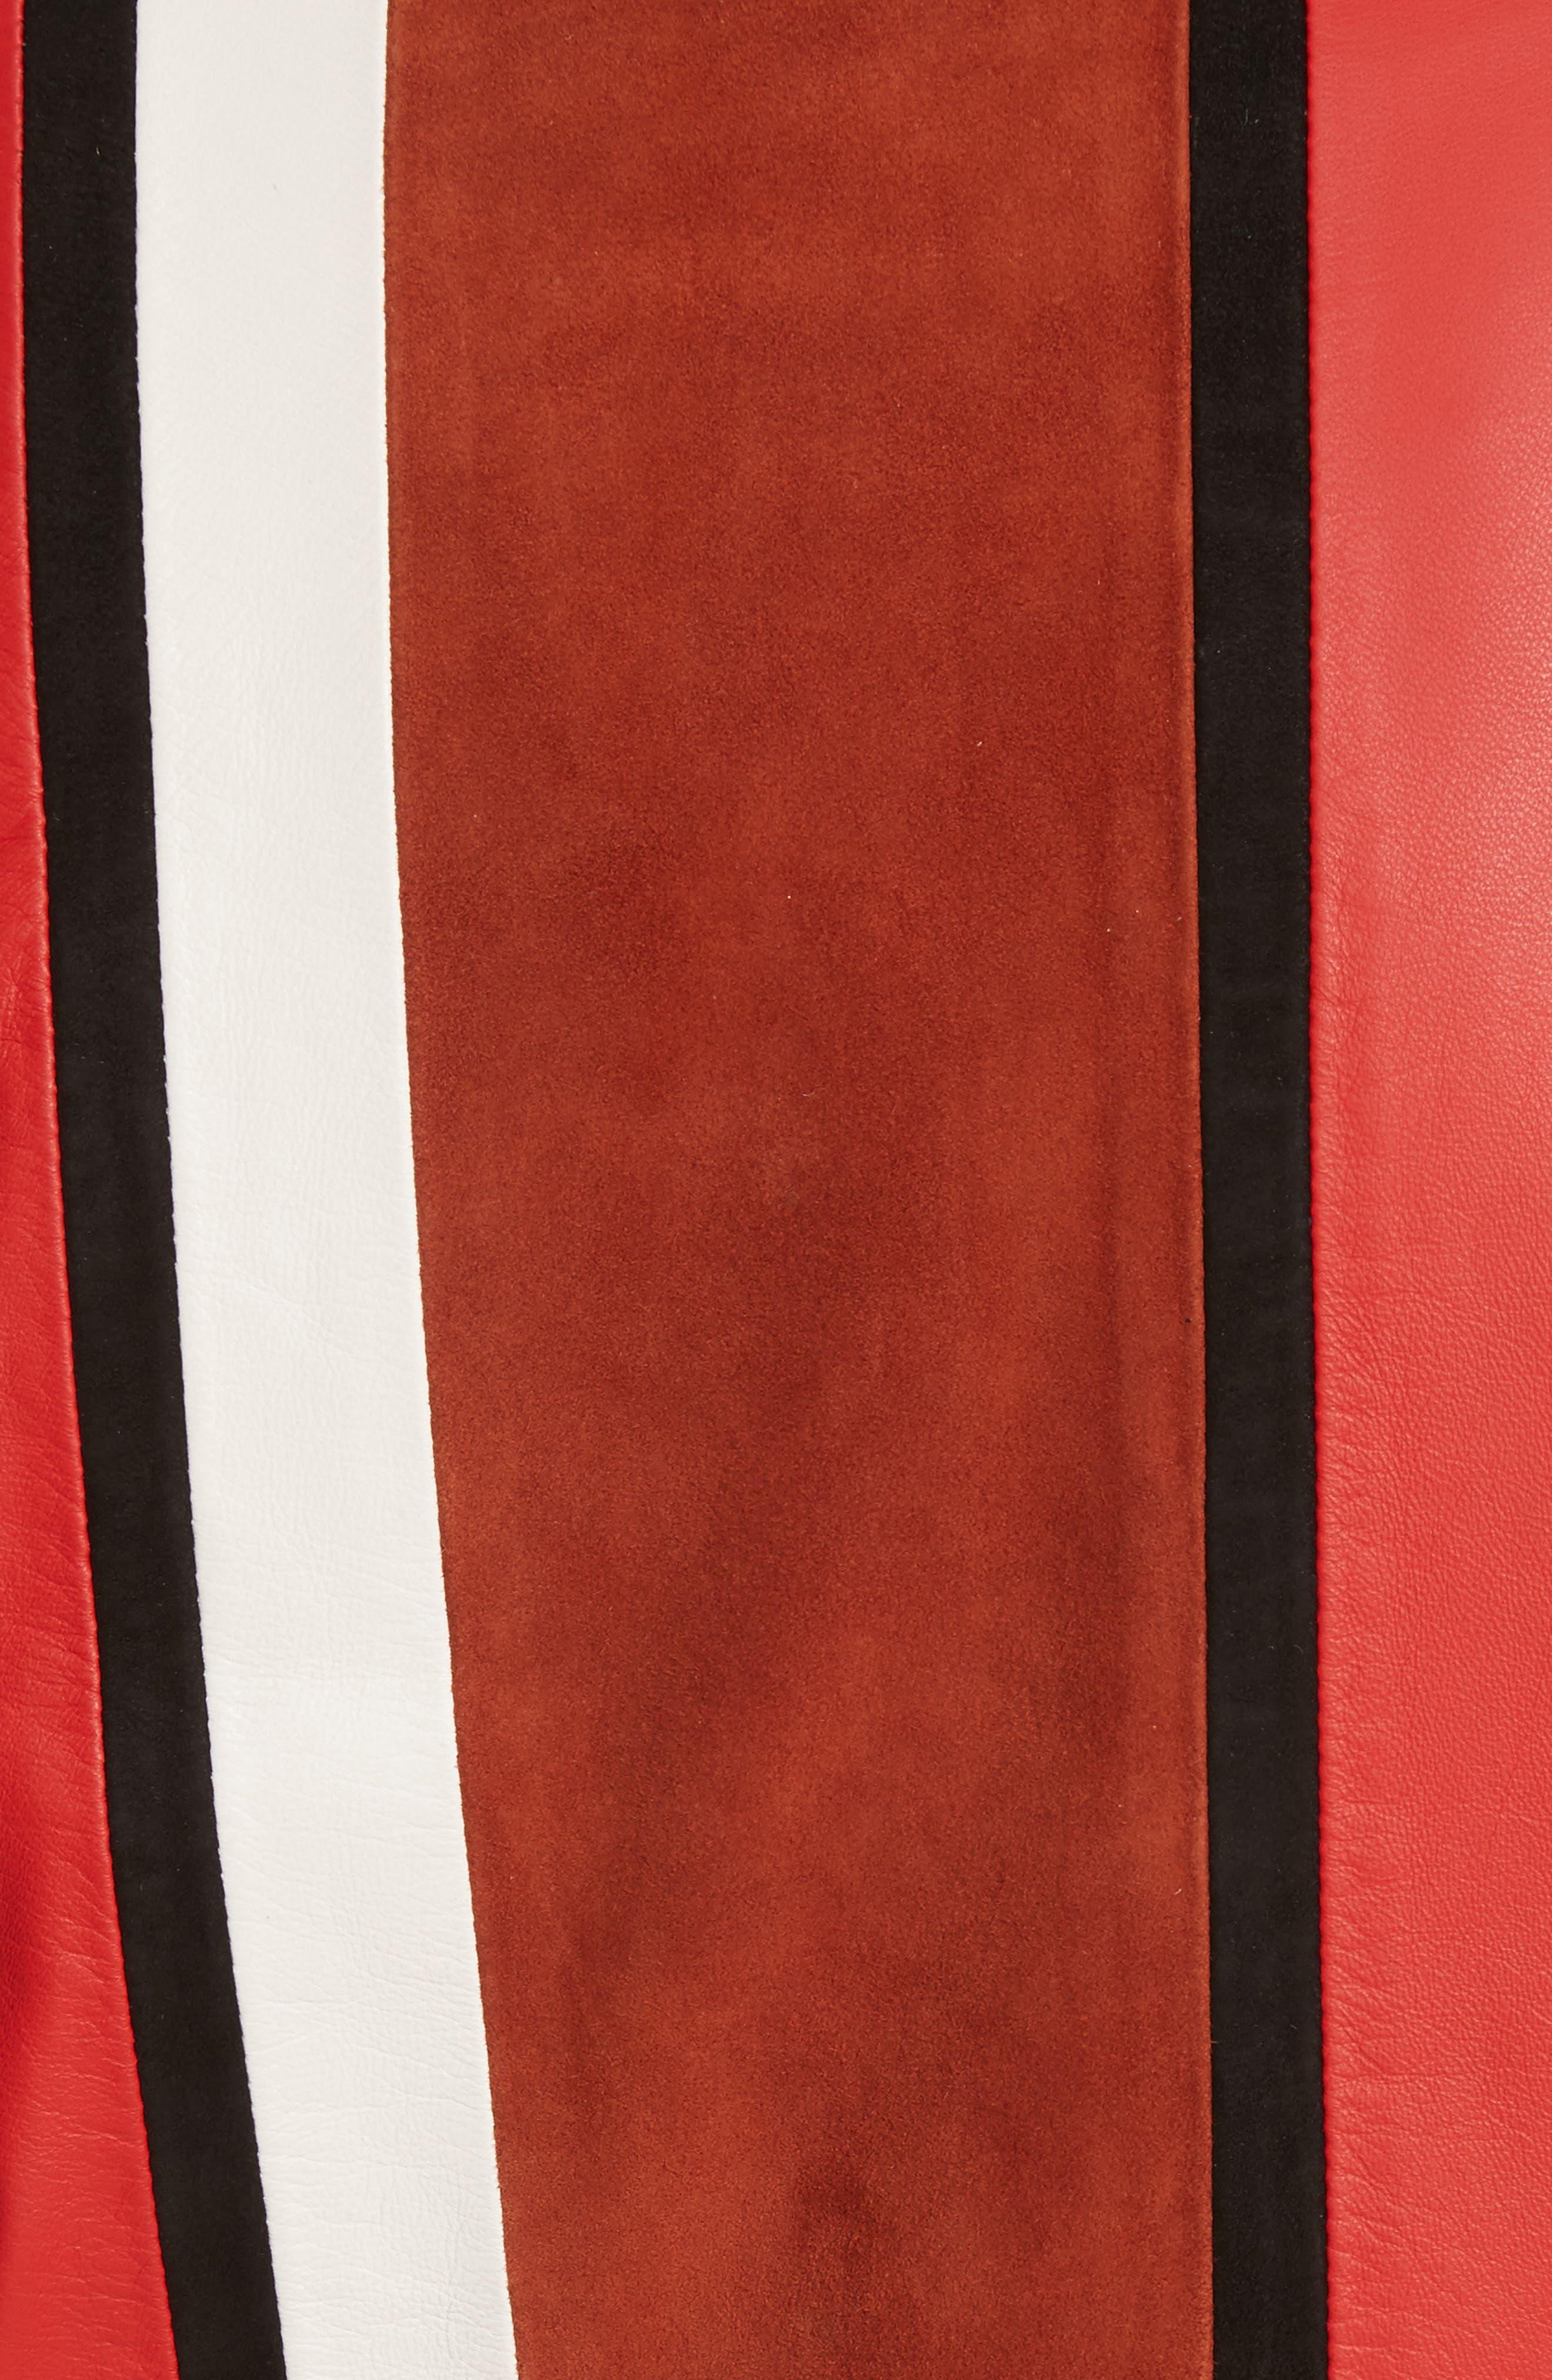 Stripe Collarless Leather Jacket,                             Alternate thumbnail 6, color,                             621